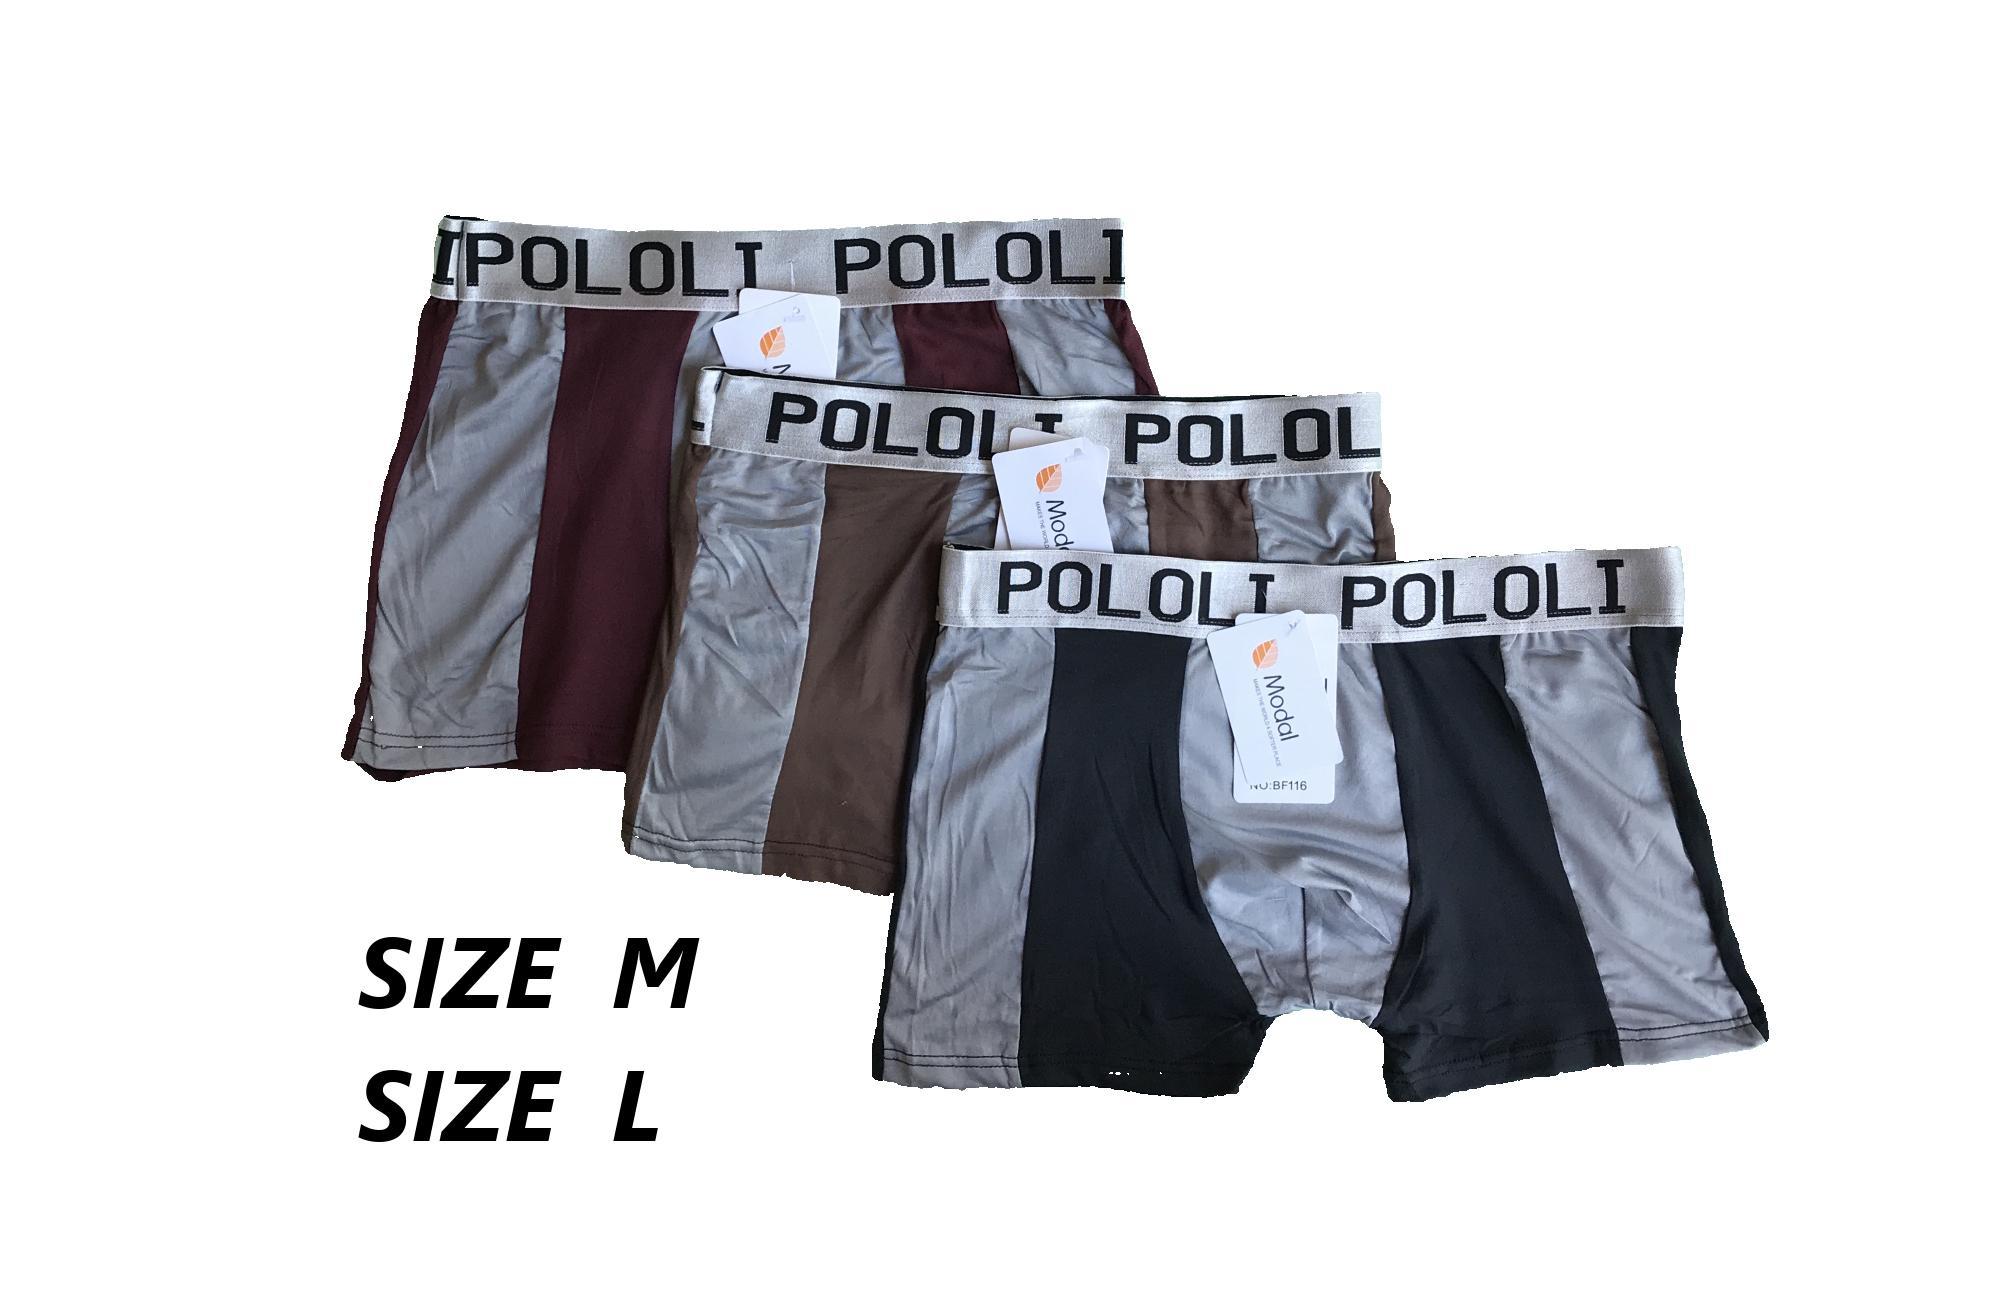 PADIe - 3 PCS Celana Dalam Pria model Boxer Multi Colour /sempak/underwear Laki-laki